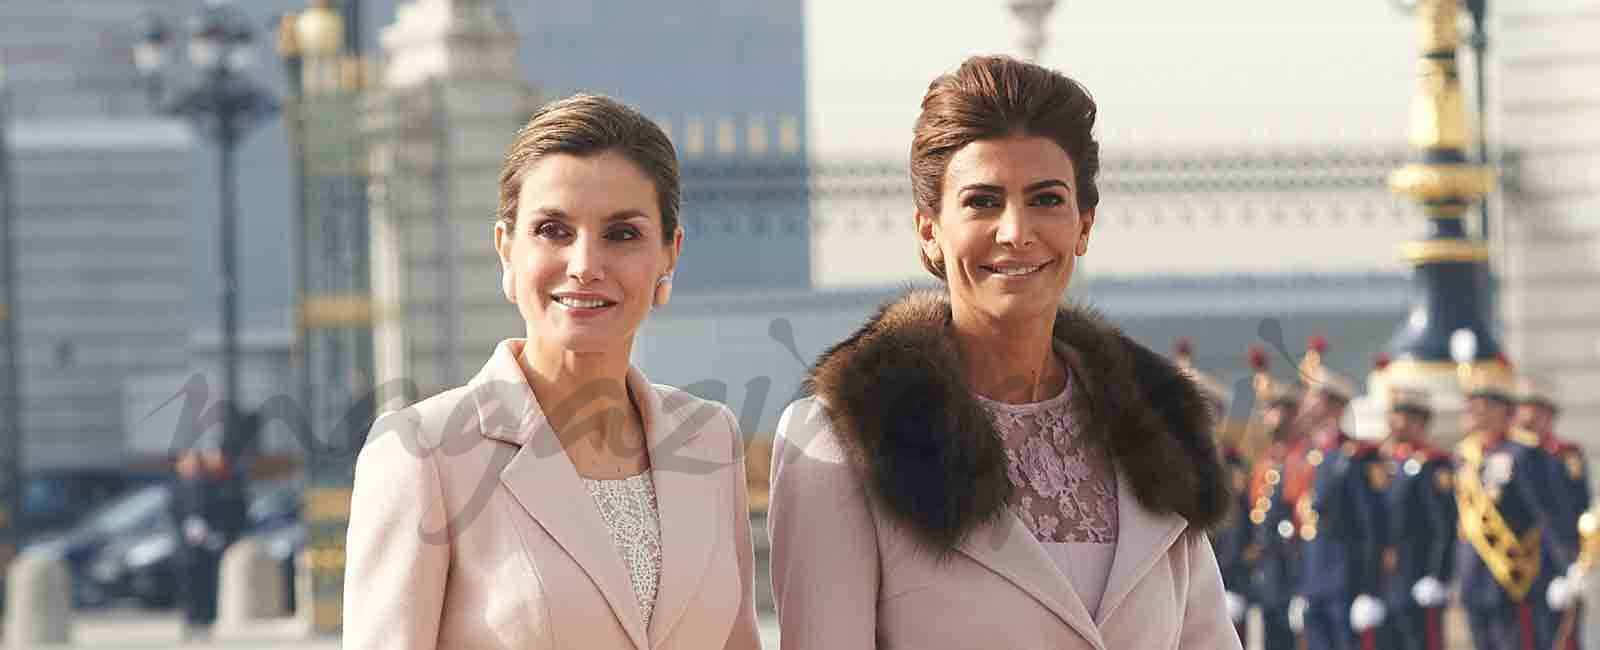 La reina Letizia y Juliana Awada compiten en elegancia